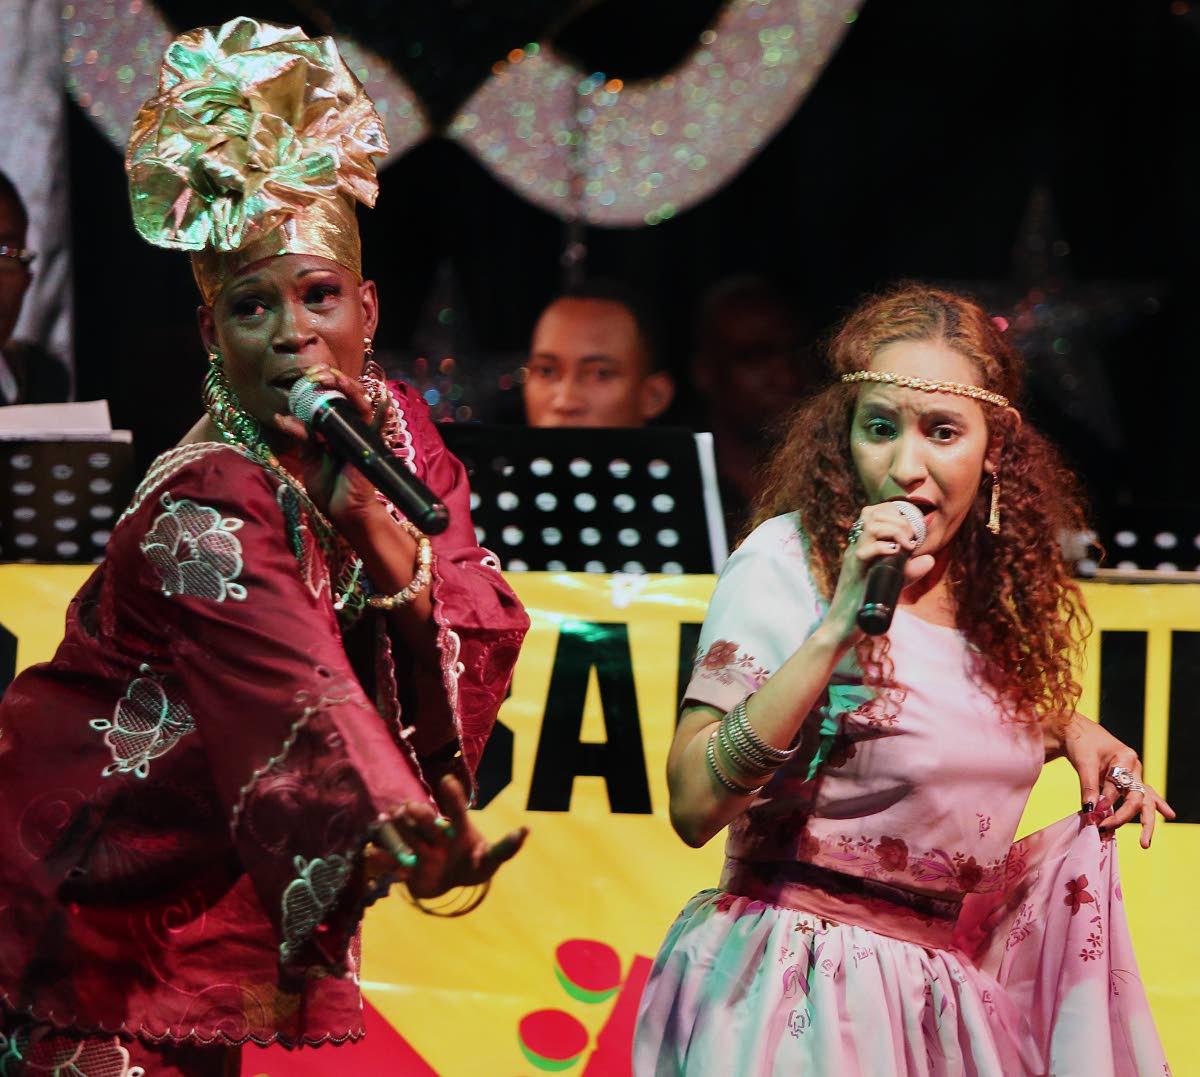 Josanne Rodriguez, left, and Empress Natty (Natalie Joseph Settle) perform Feel like Dancing at the Divas Calypso Cabaret International at Mas Camp Pub, Port of Spain on February 1, 2017.